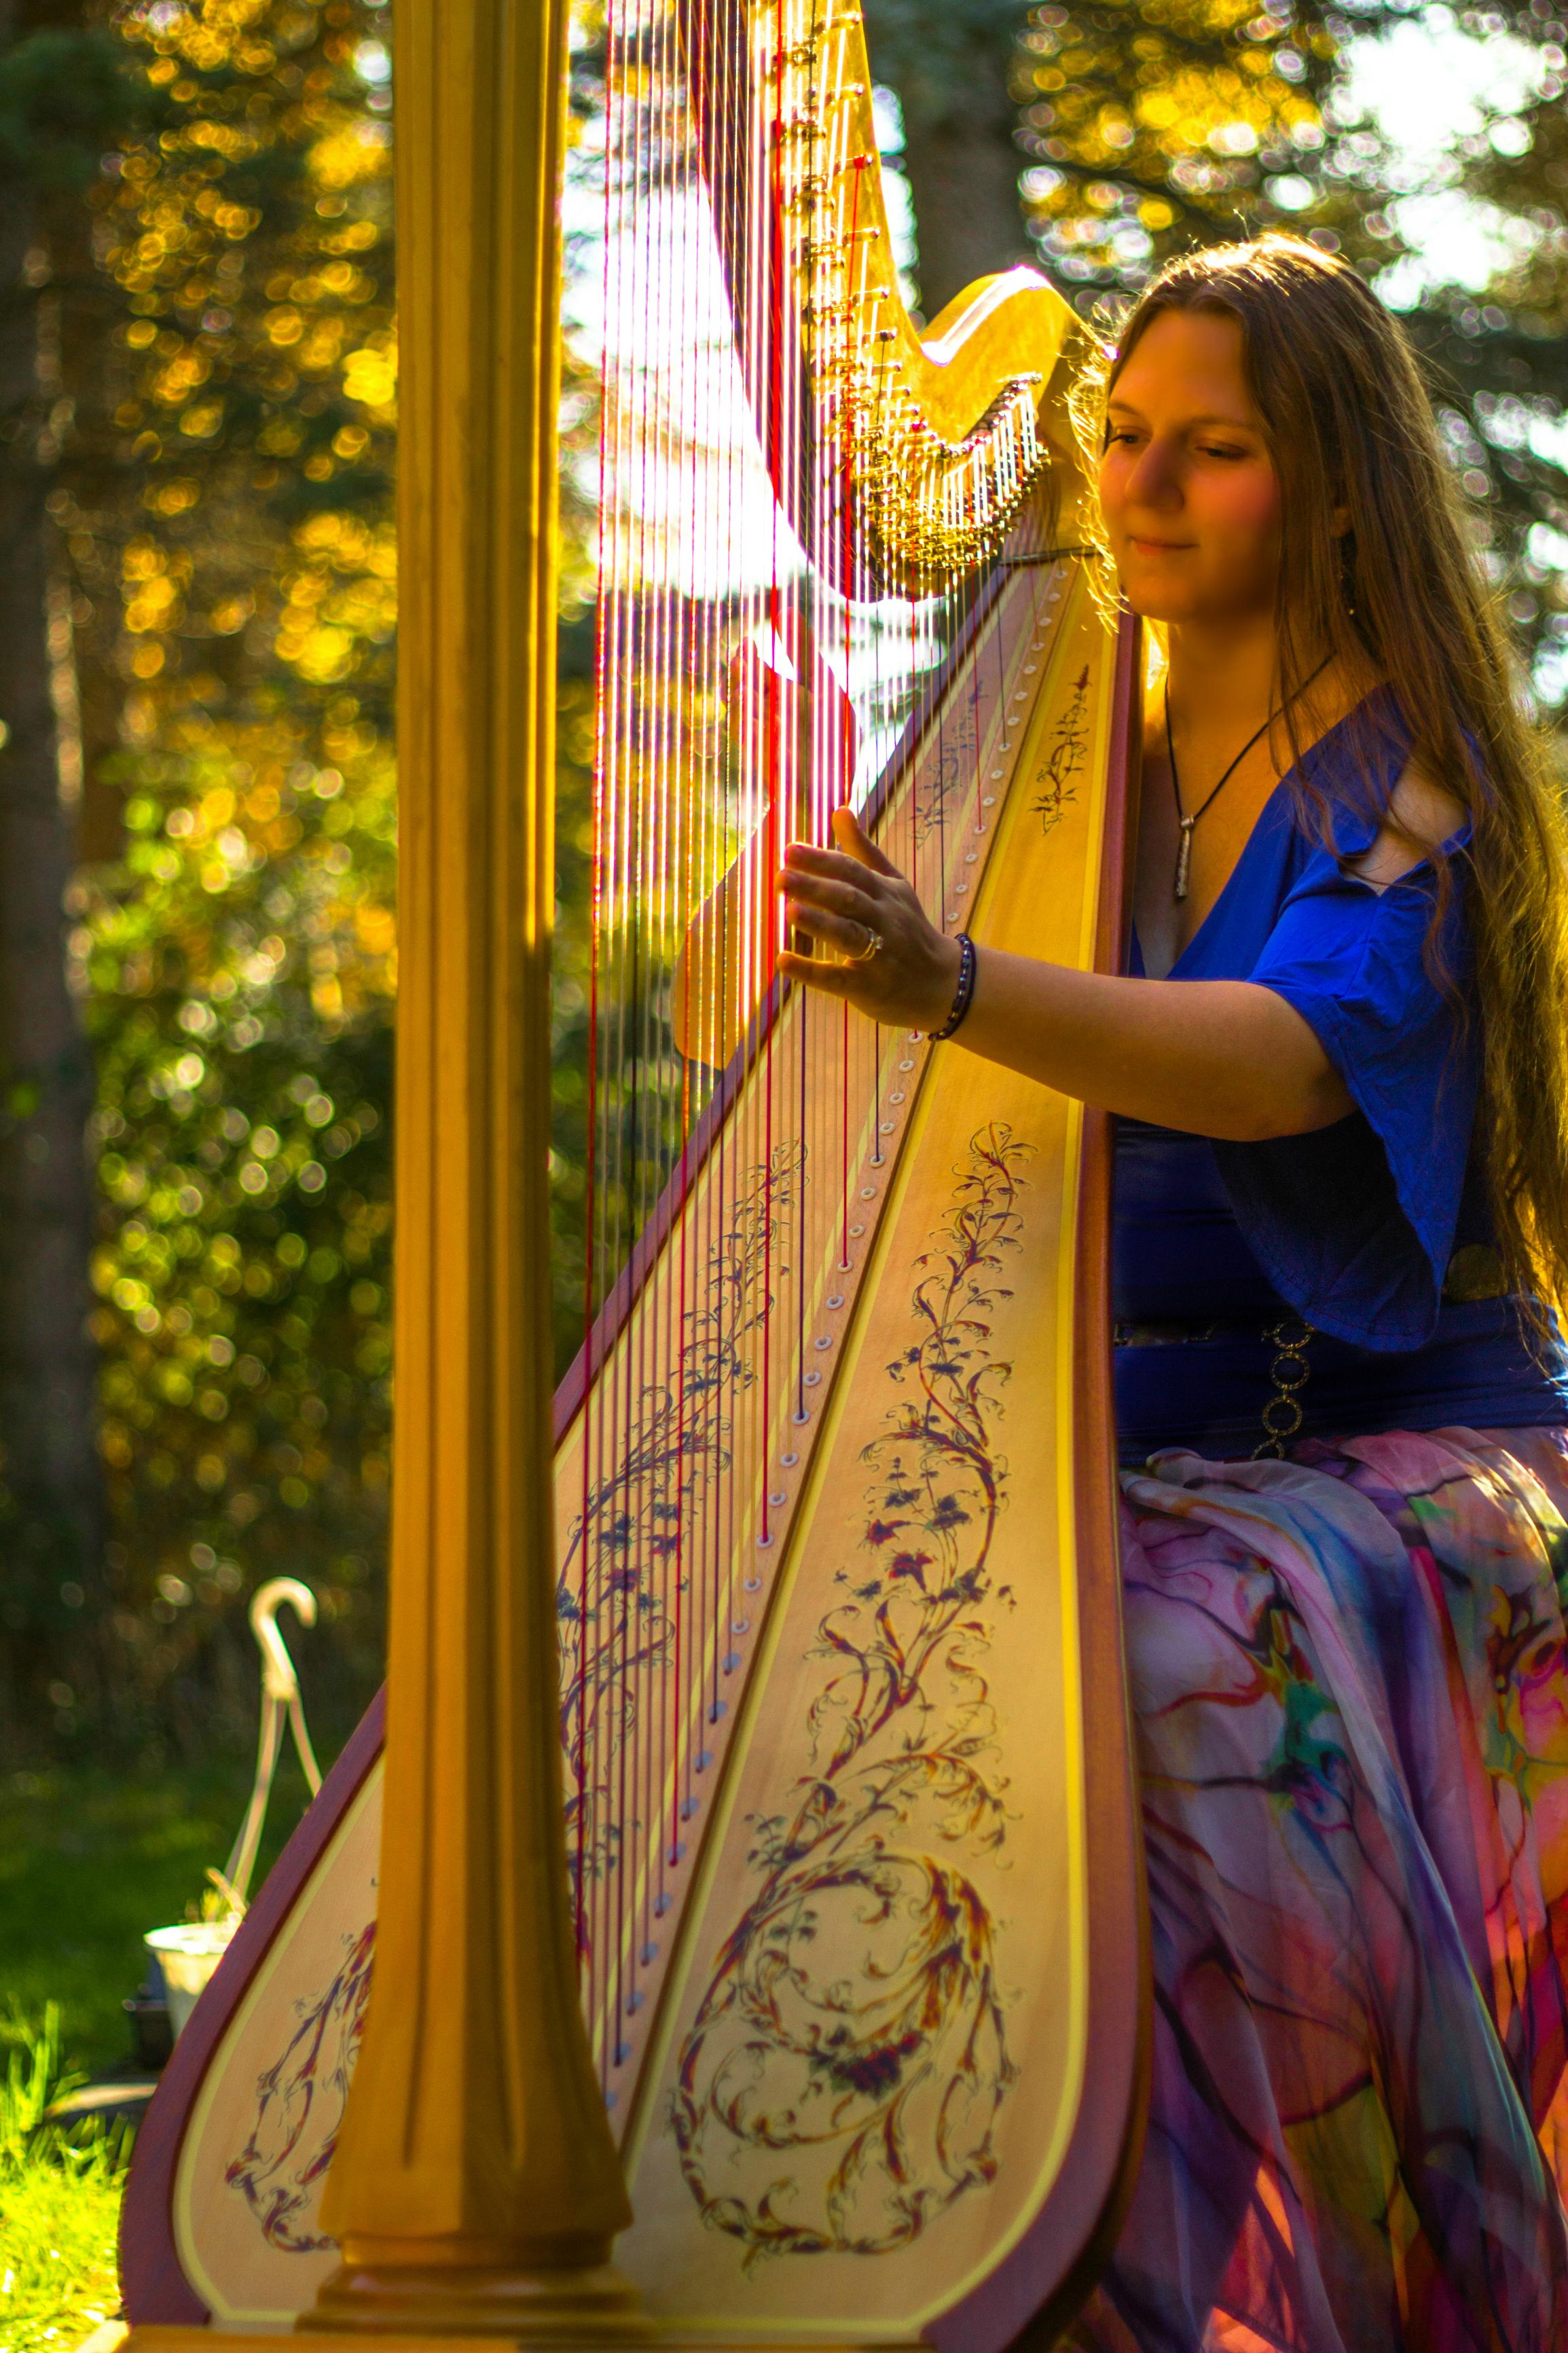 Michigan Harpist